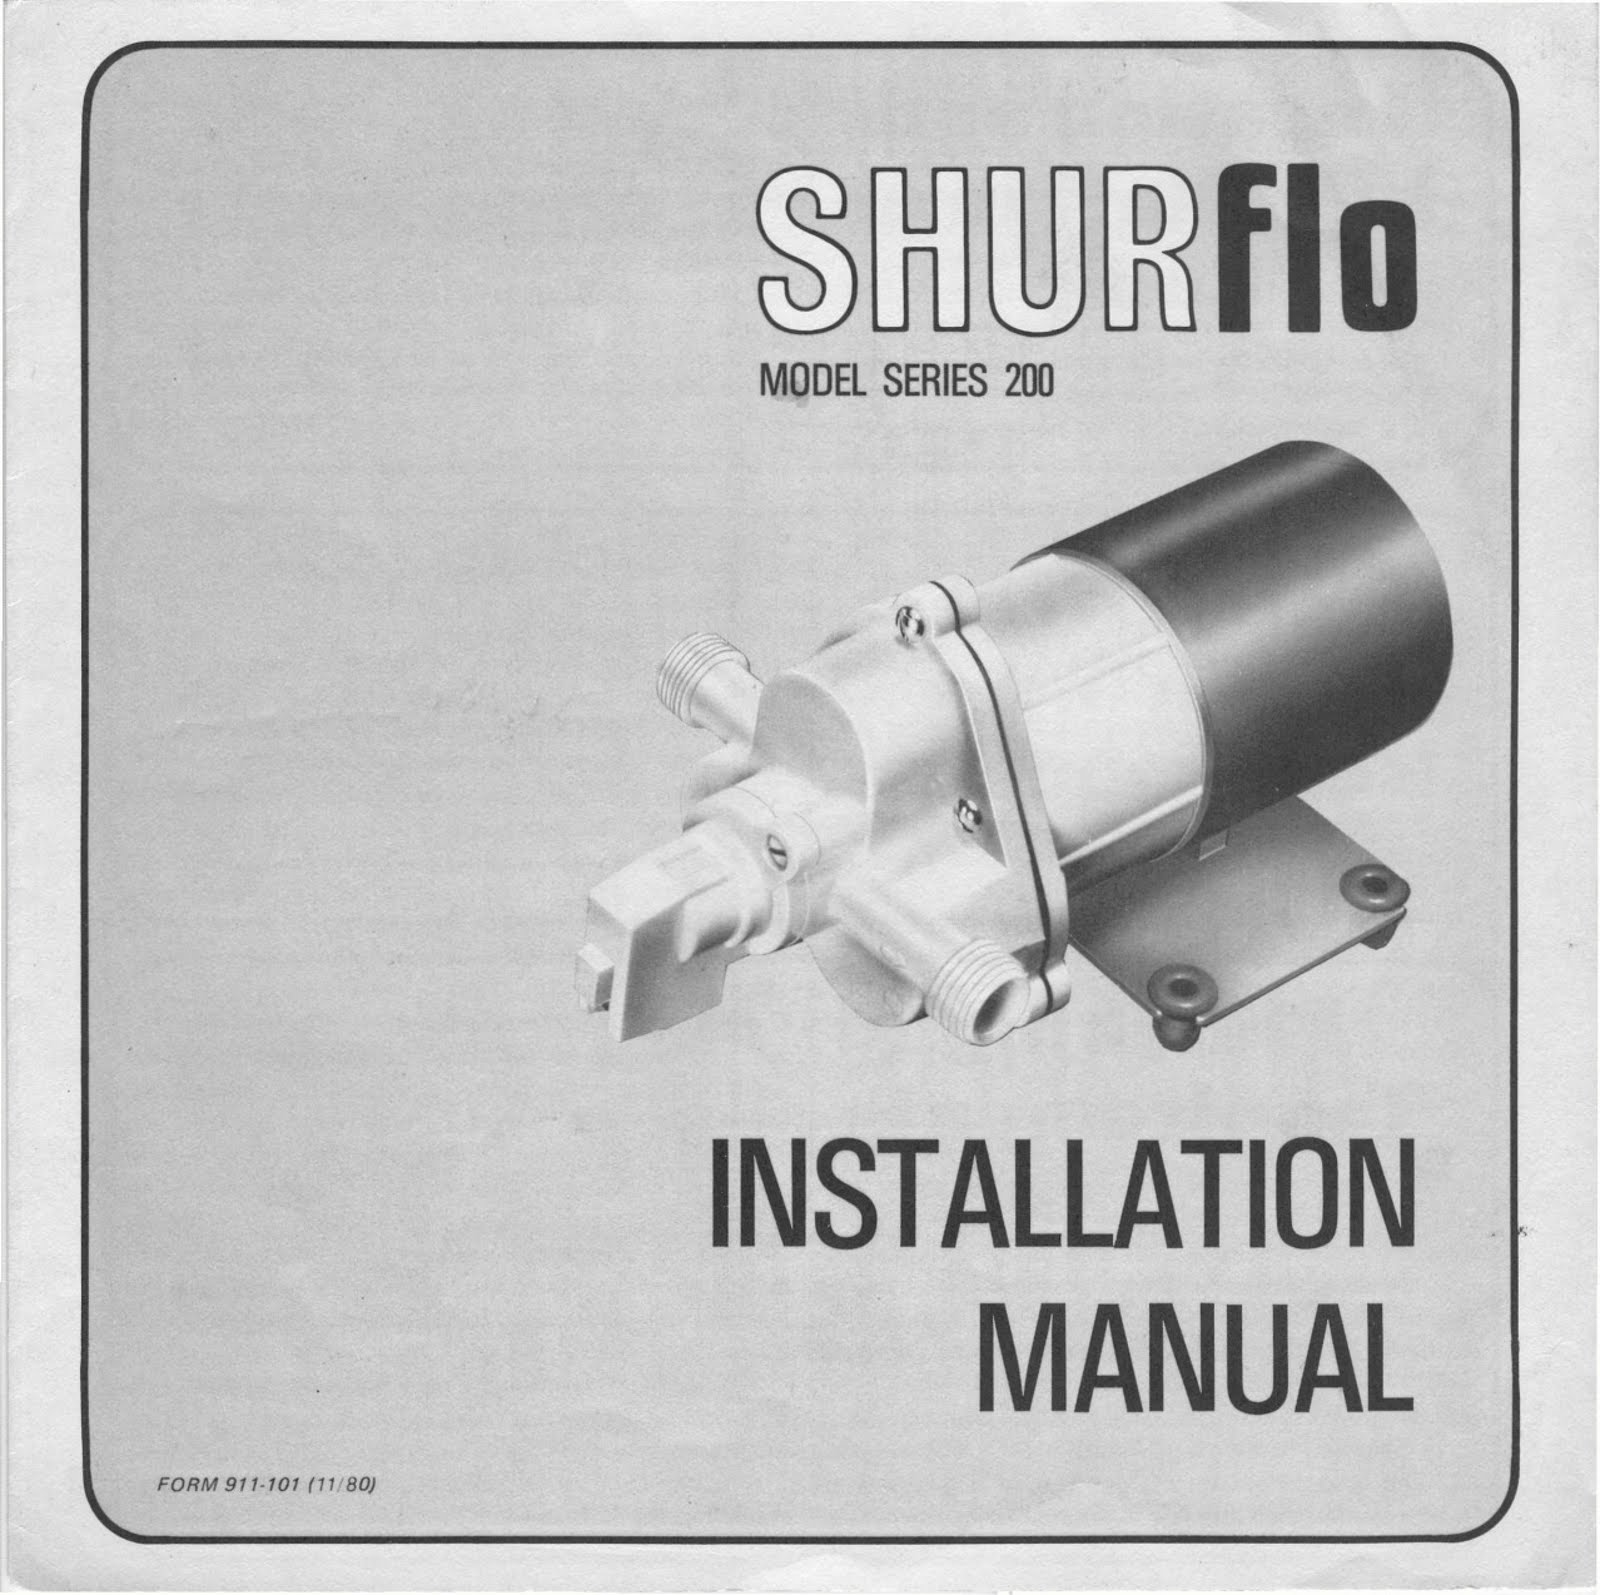 shurflo rv water pump wiring diagram 1994 yamaha virago 535 thetford aqua magic toilet get free